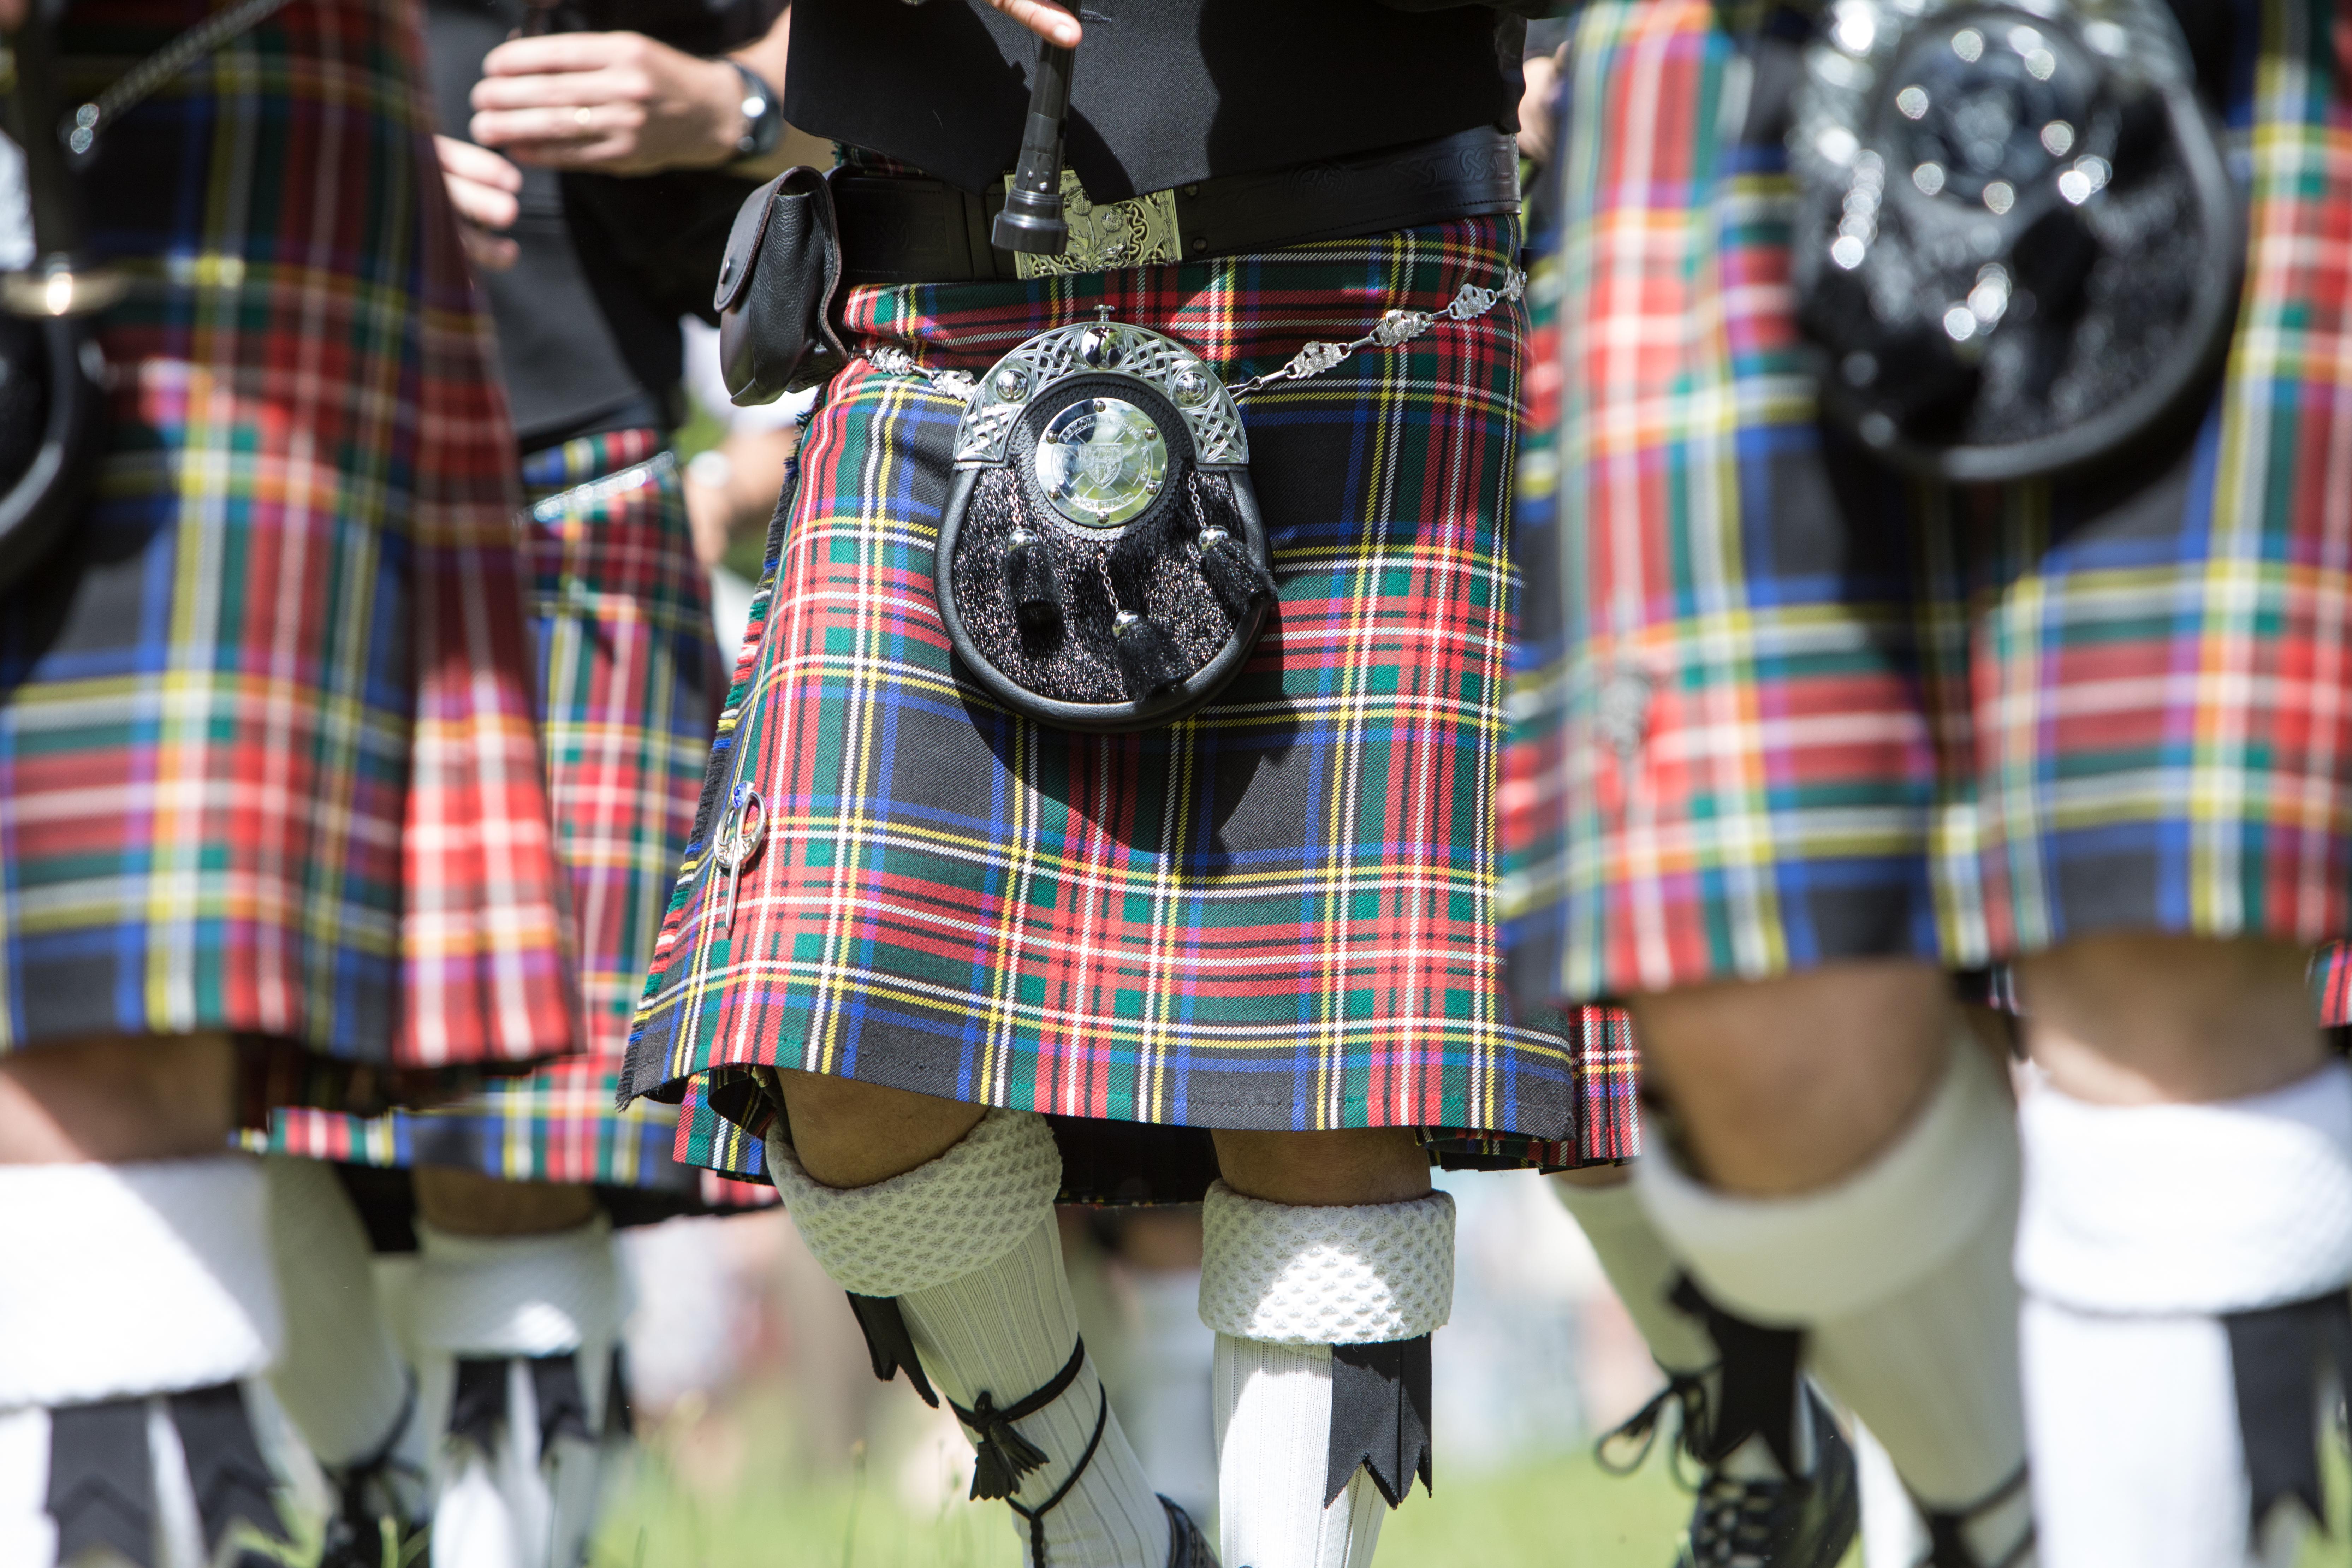 Fêtes franco-écossaises - aubigny